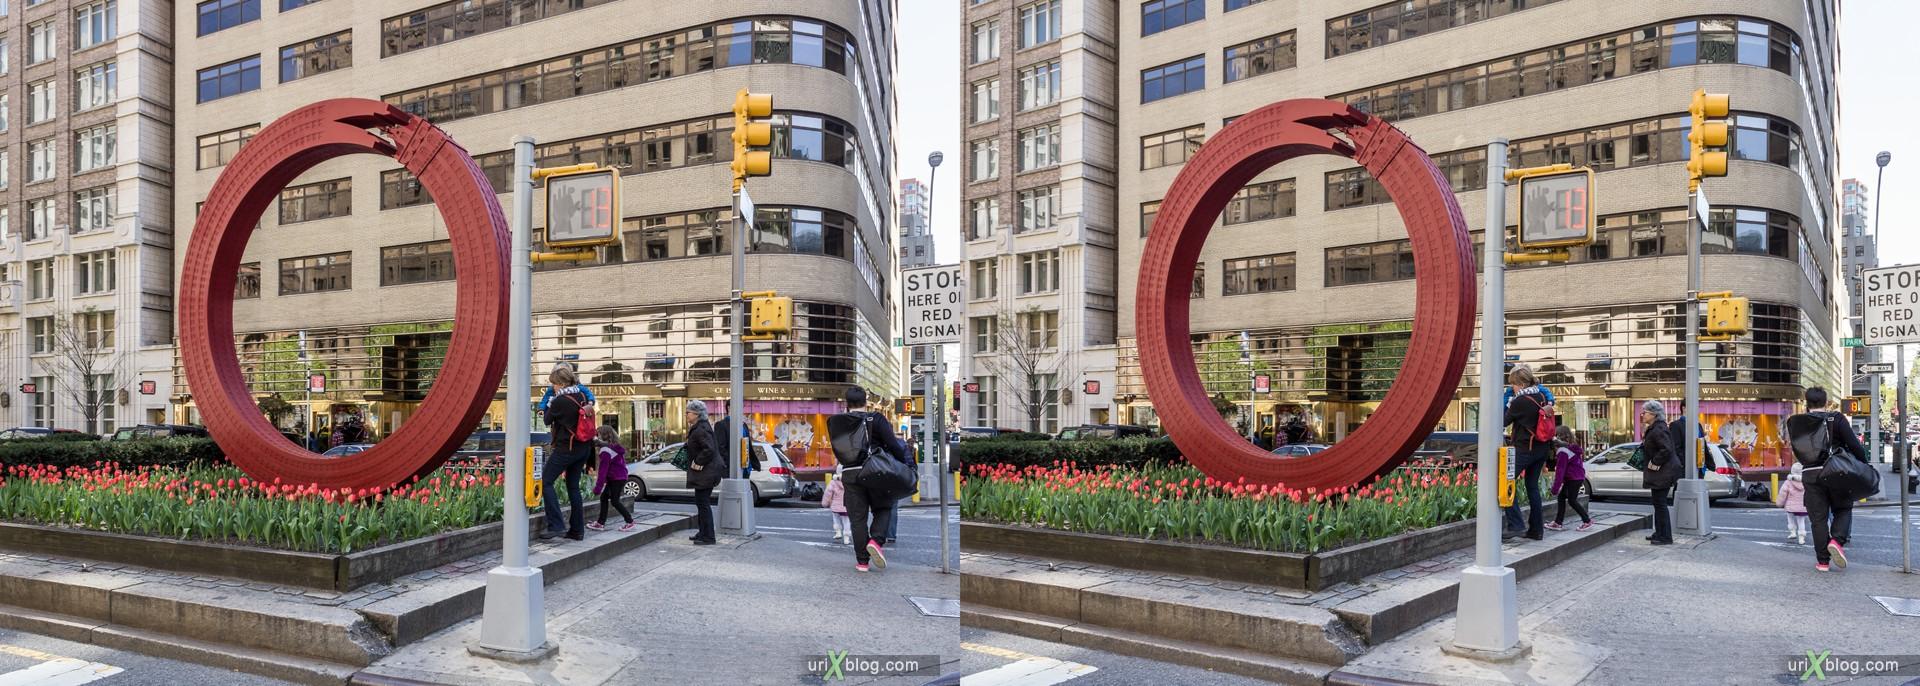 2013, Park Ave, NYC, New York City, USA, 3D, stereo pair, cross-eyed, crossview, cross view stereo pair, stereoscopic